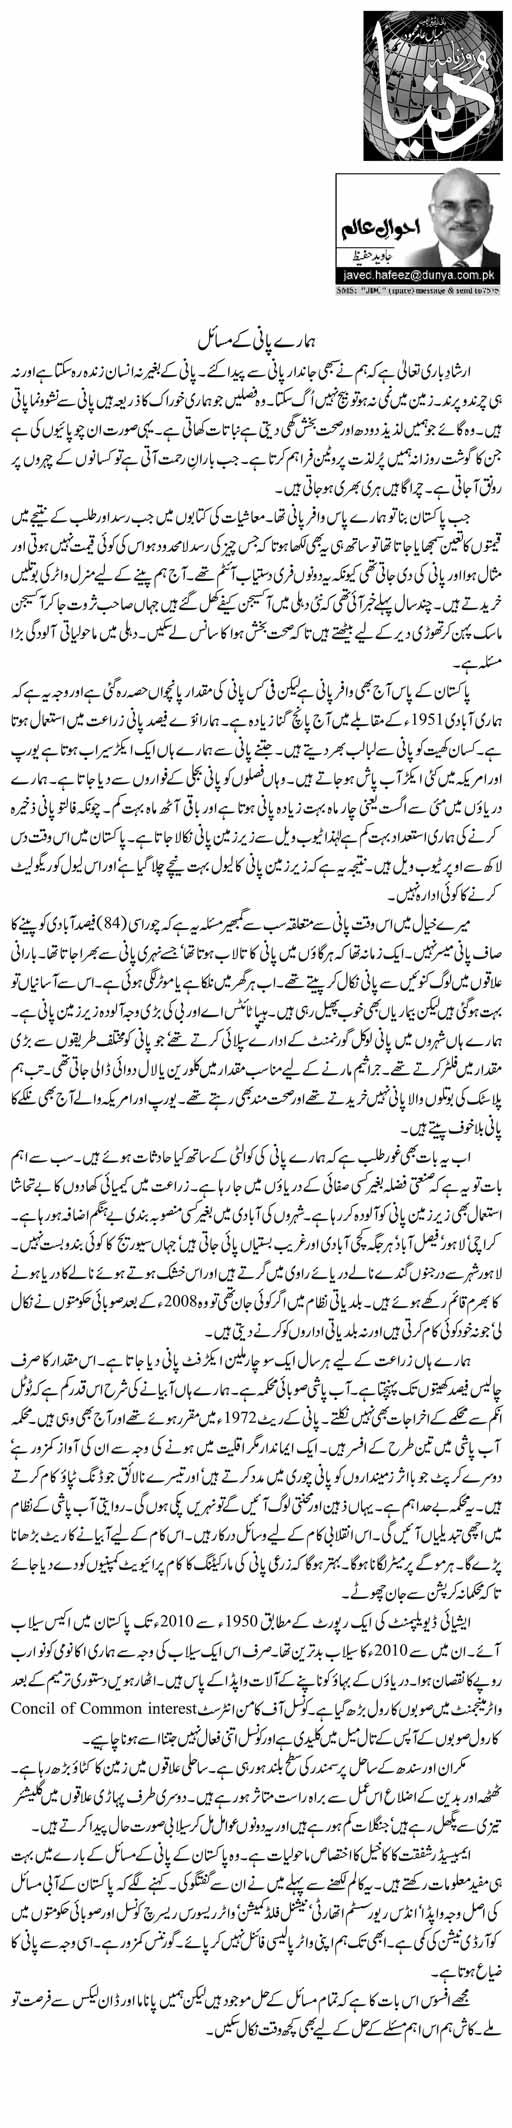 Hamare Pani Ke Masail | Javed Hafeez | Daily Urdu Columns